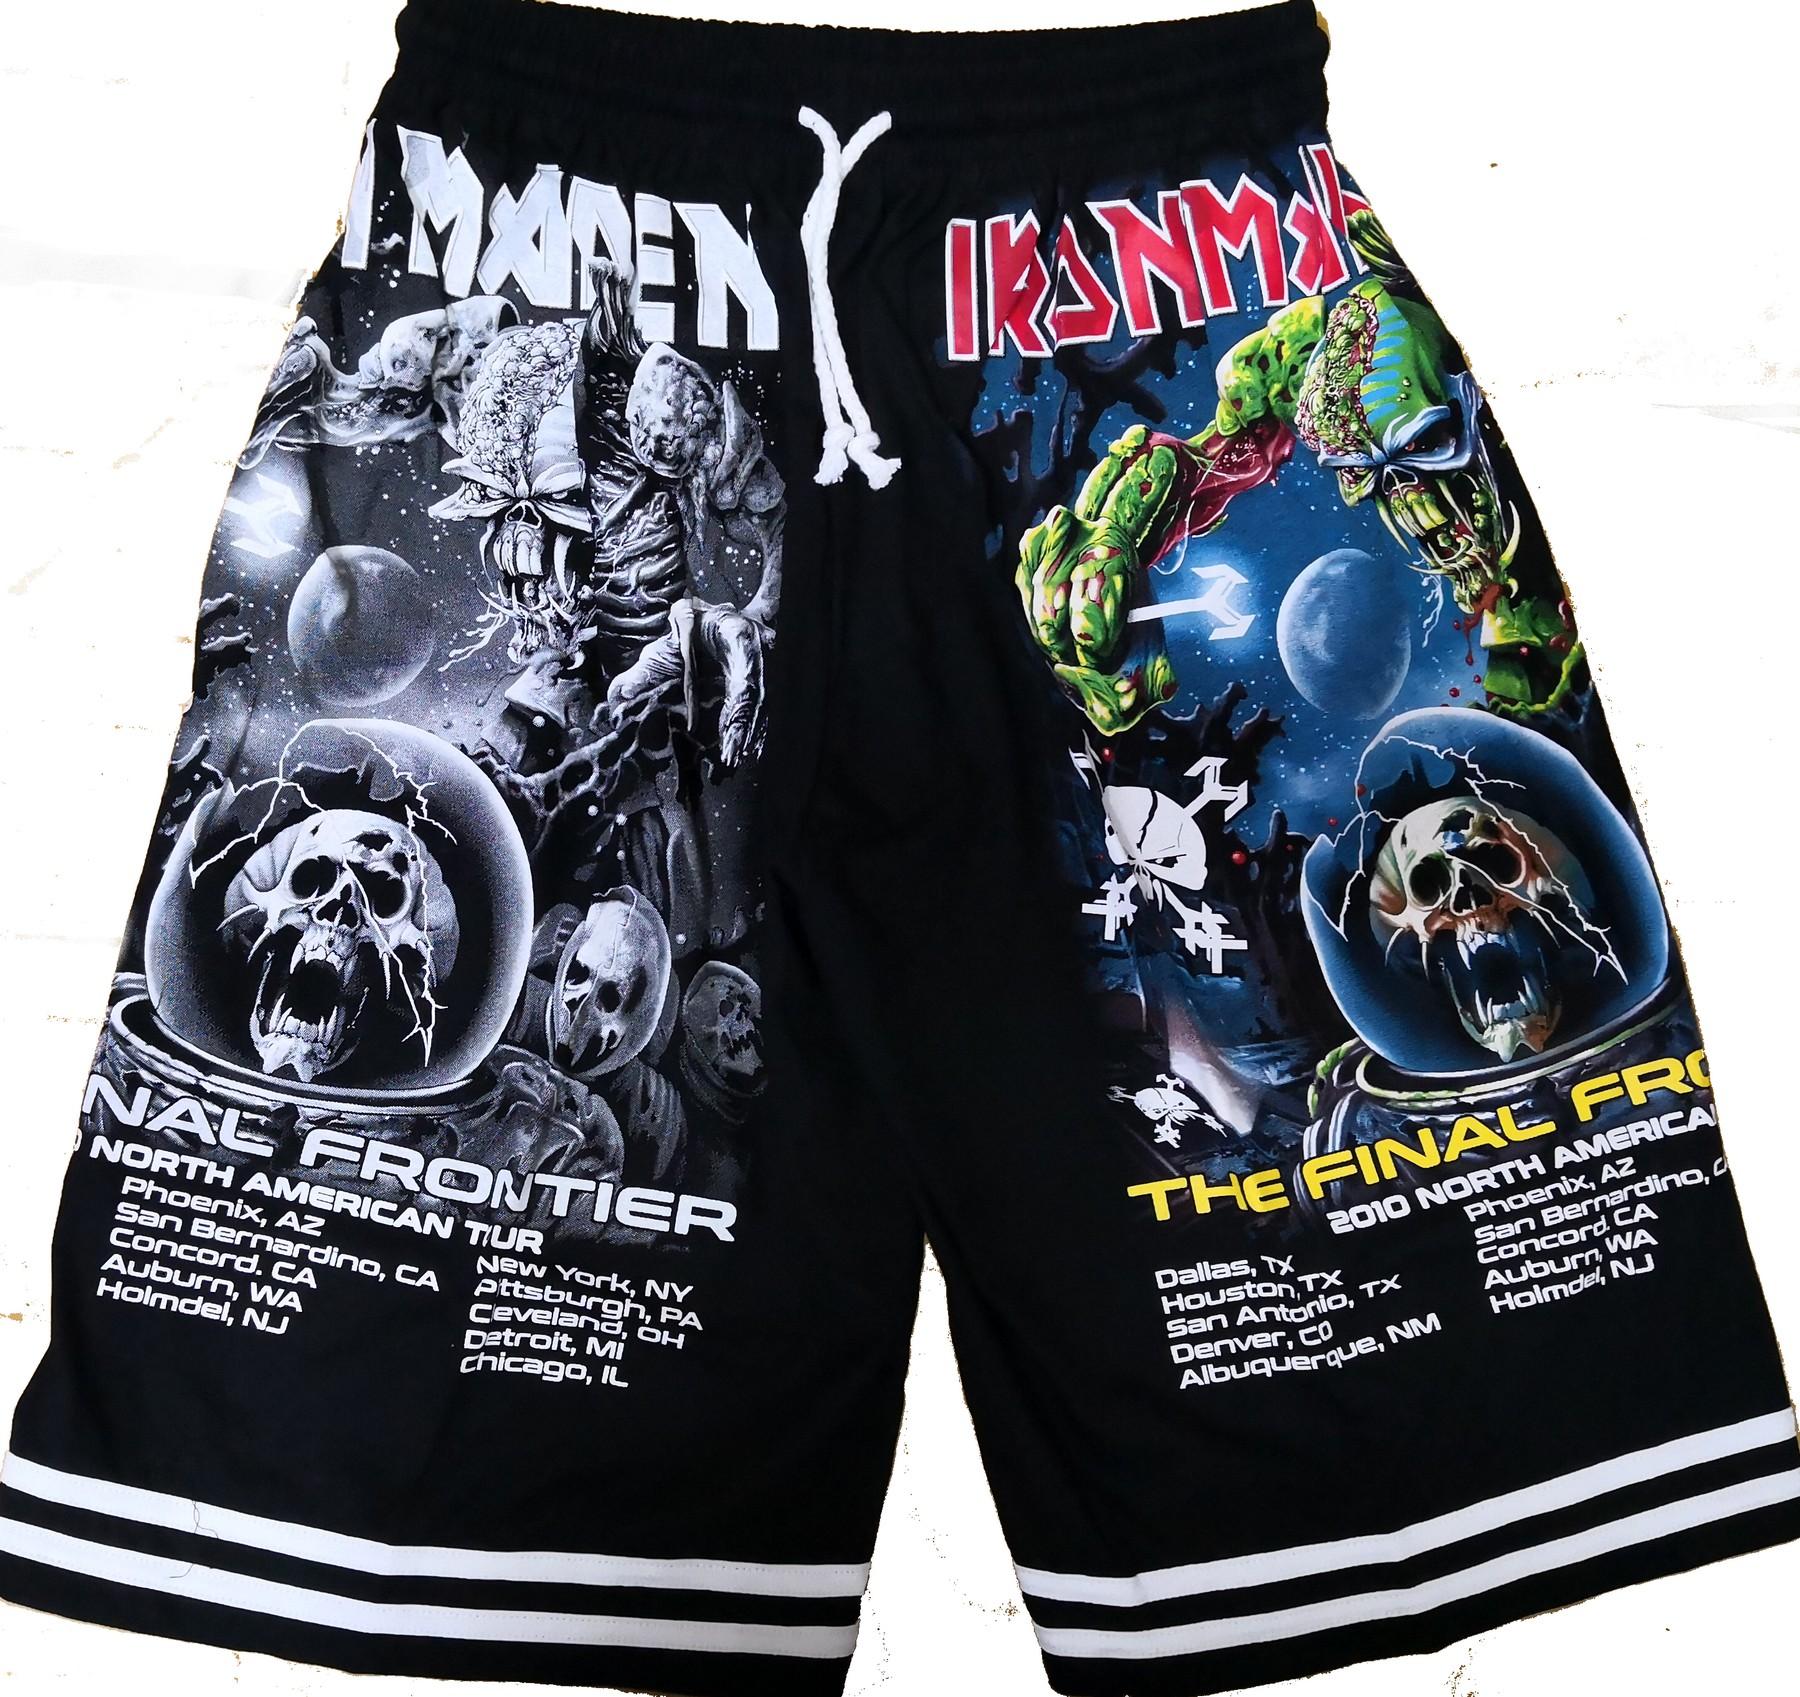 c8f811c81c Iron Maiden shorts The Final Frontier – RoxxBKK